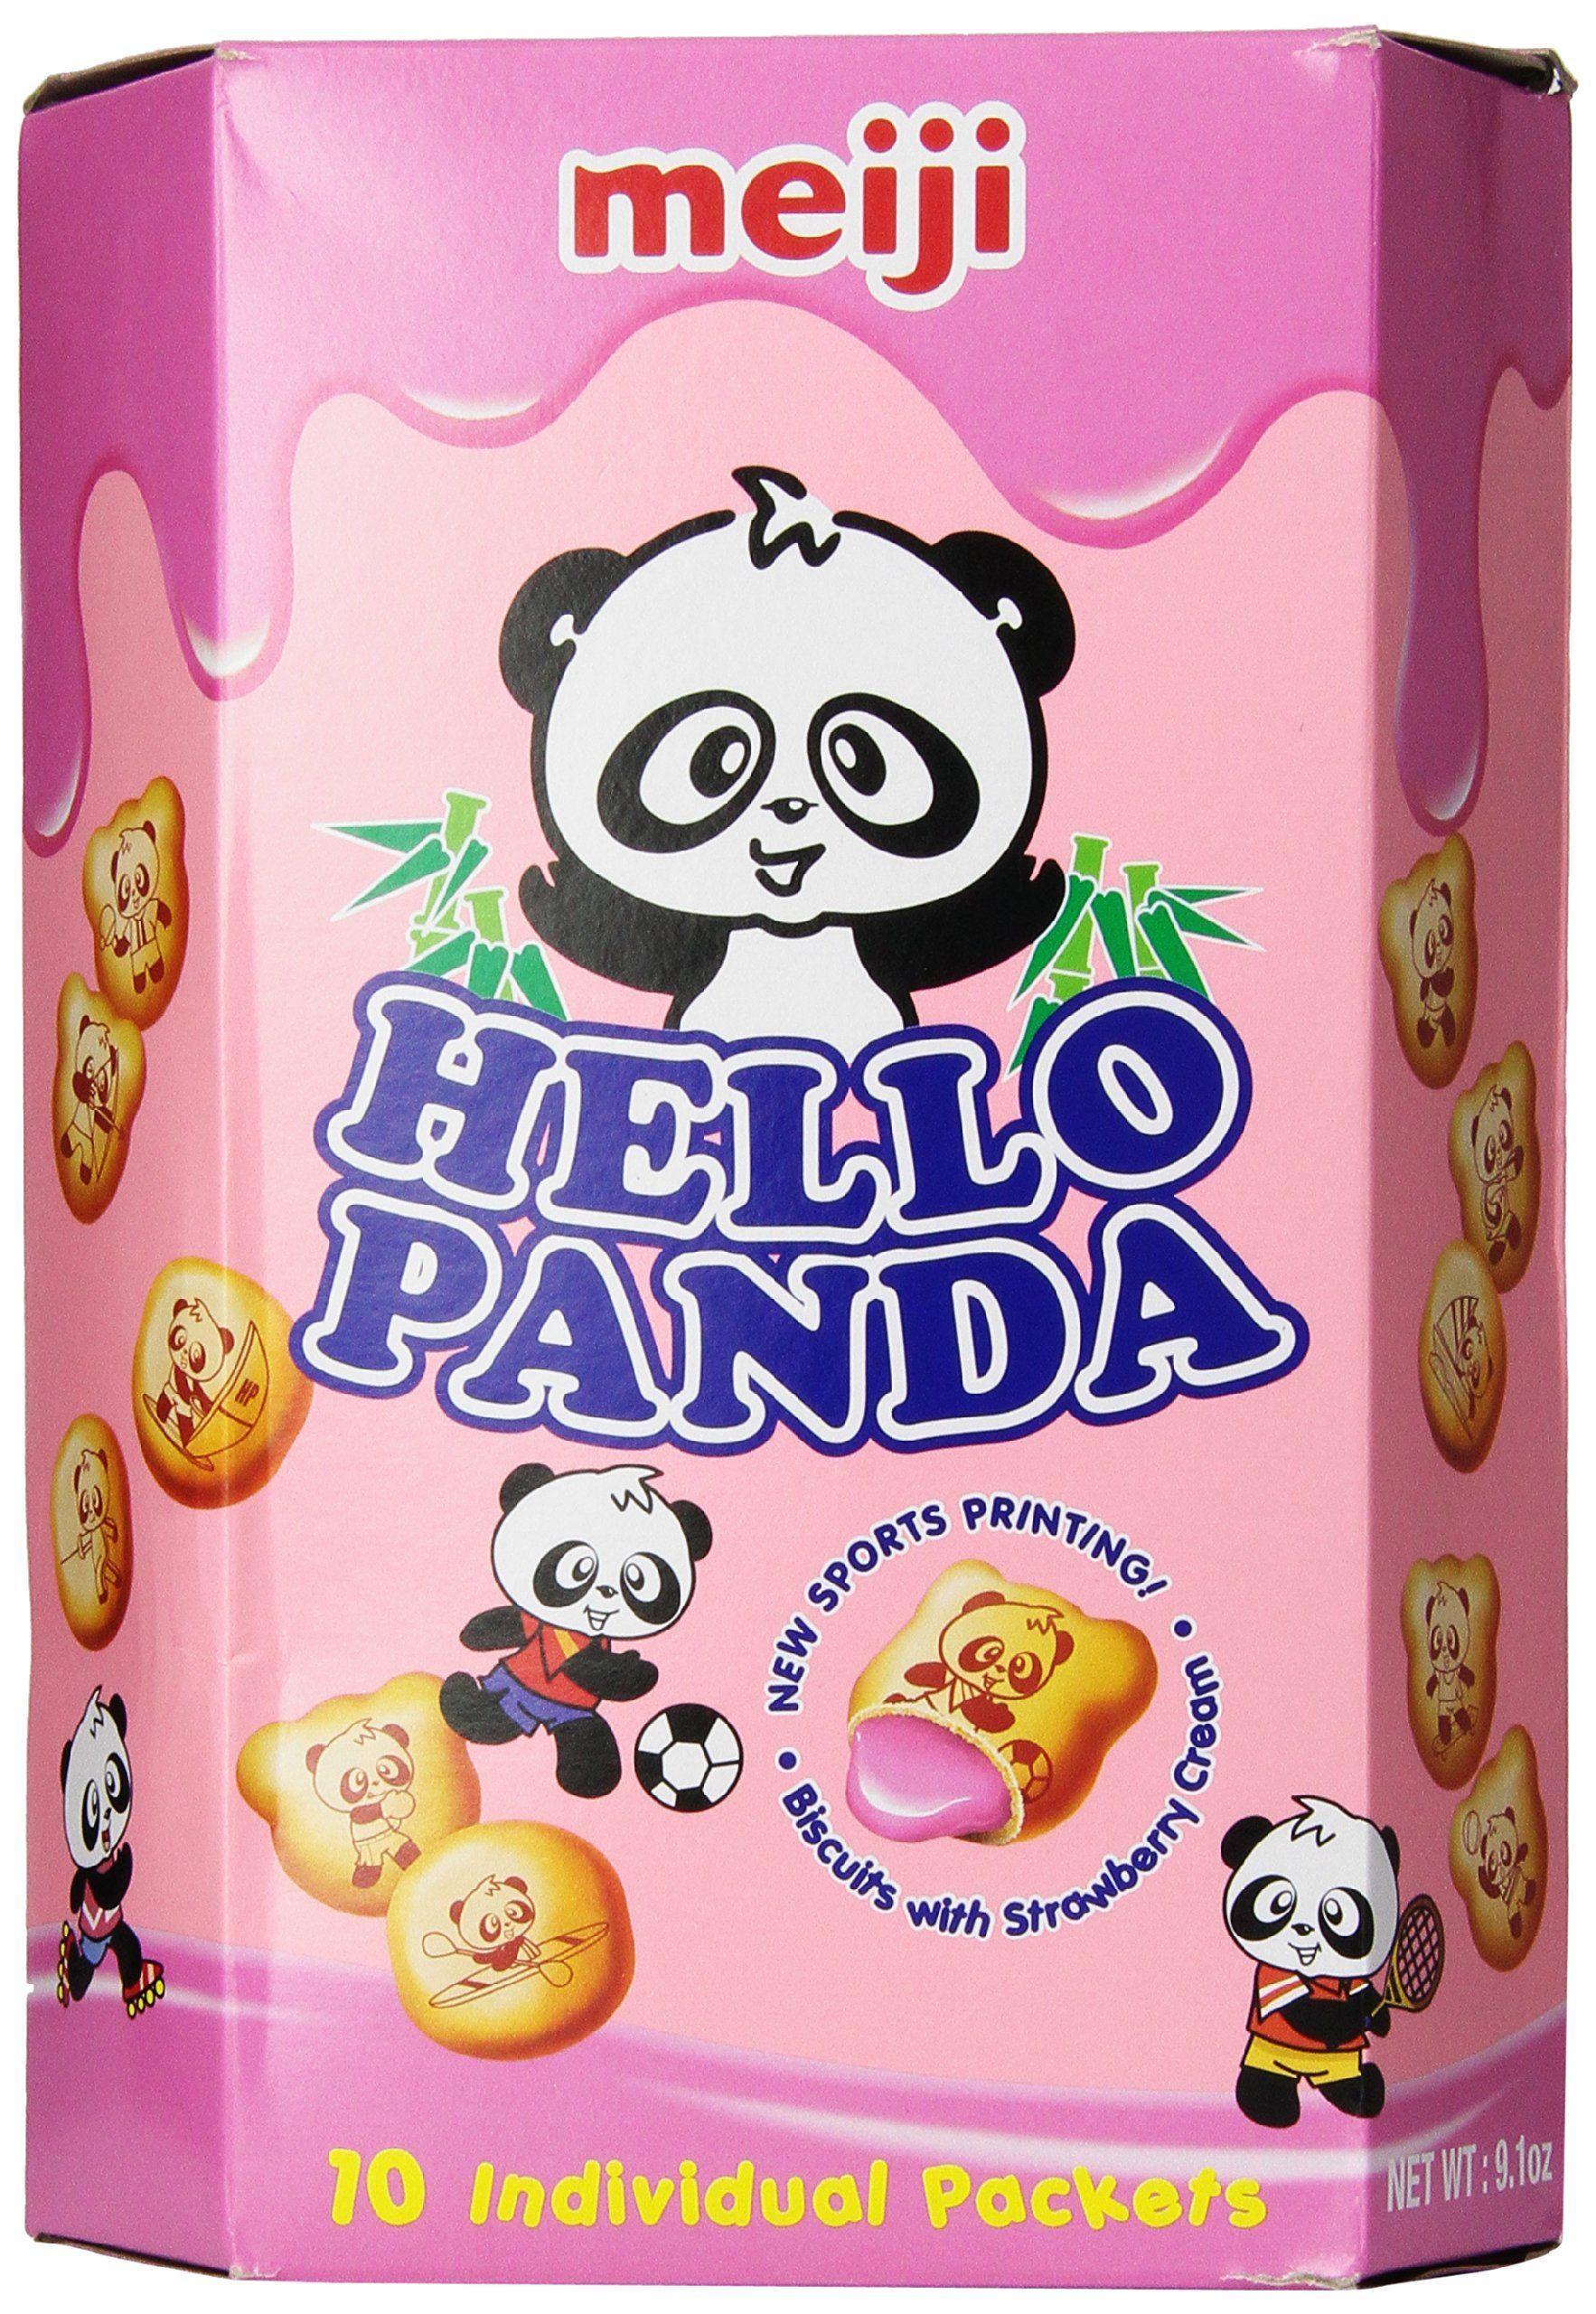 Meiji Hello Panda Cookies-L, Strawberry, 9.1 Ounce